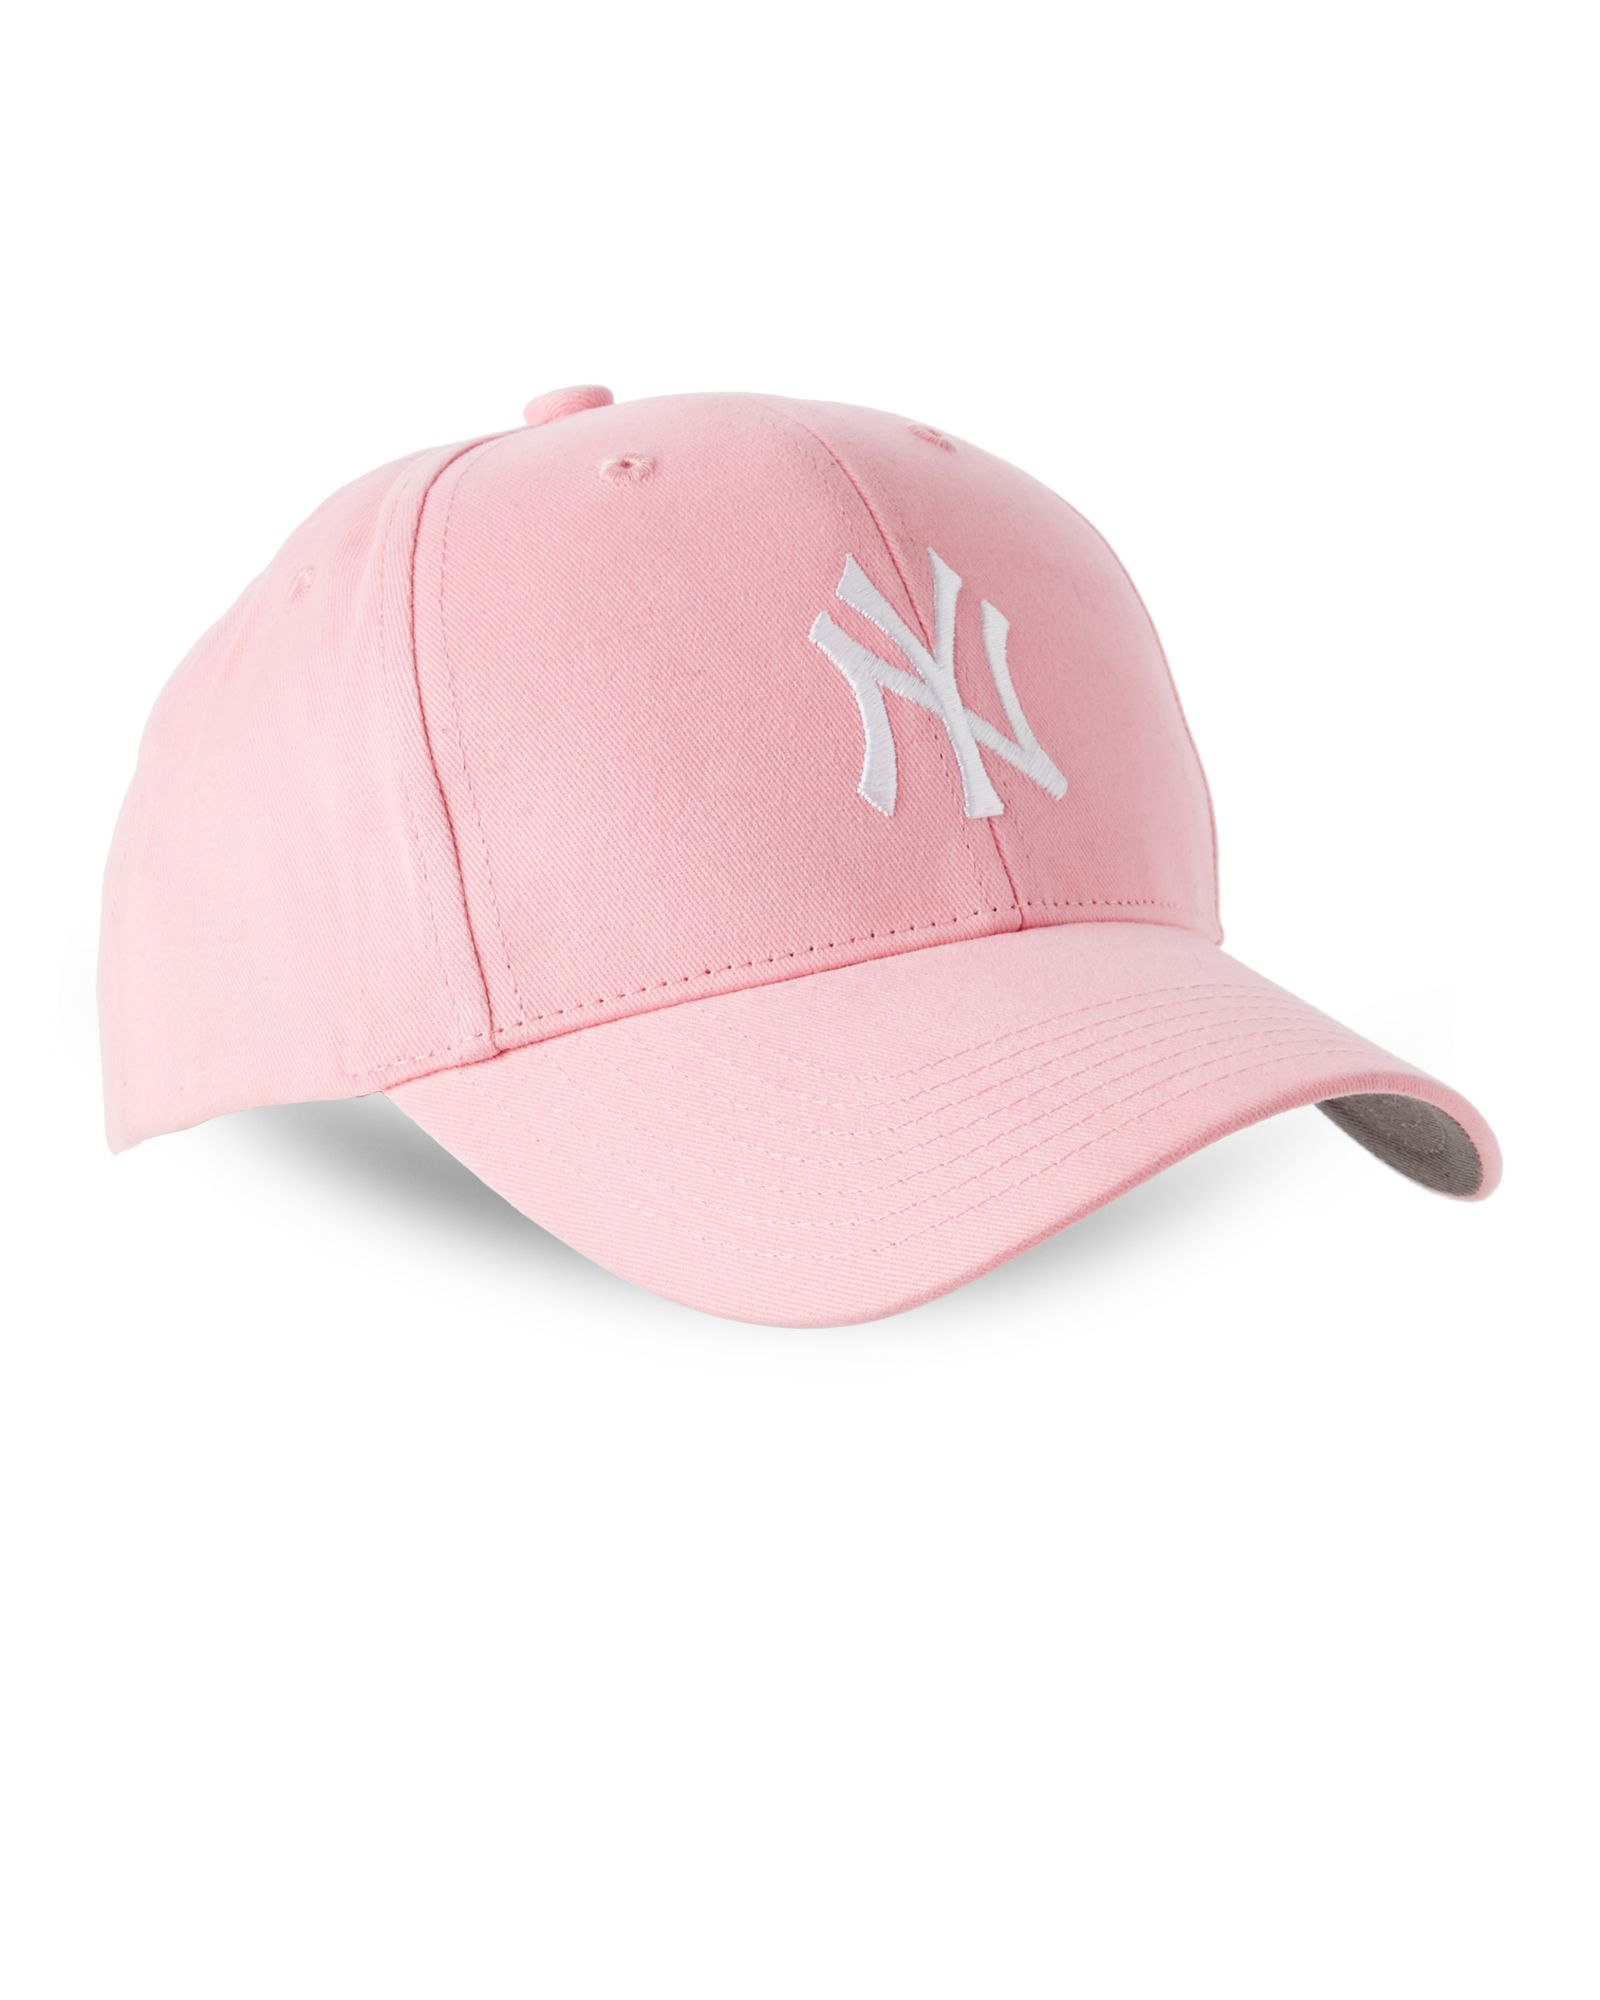 fc8e1c5f1fab3 47 Brand (Kids Girls) Adjustable Yankees Cap